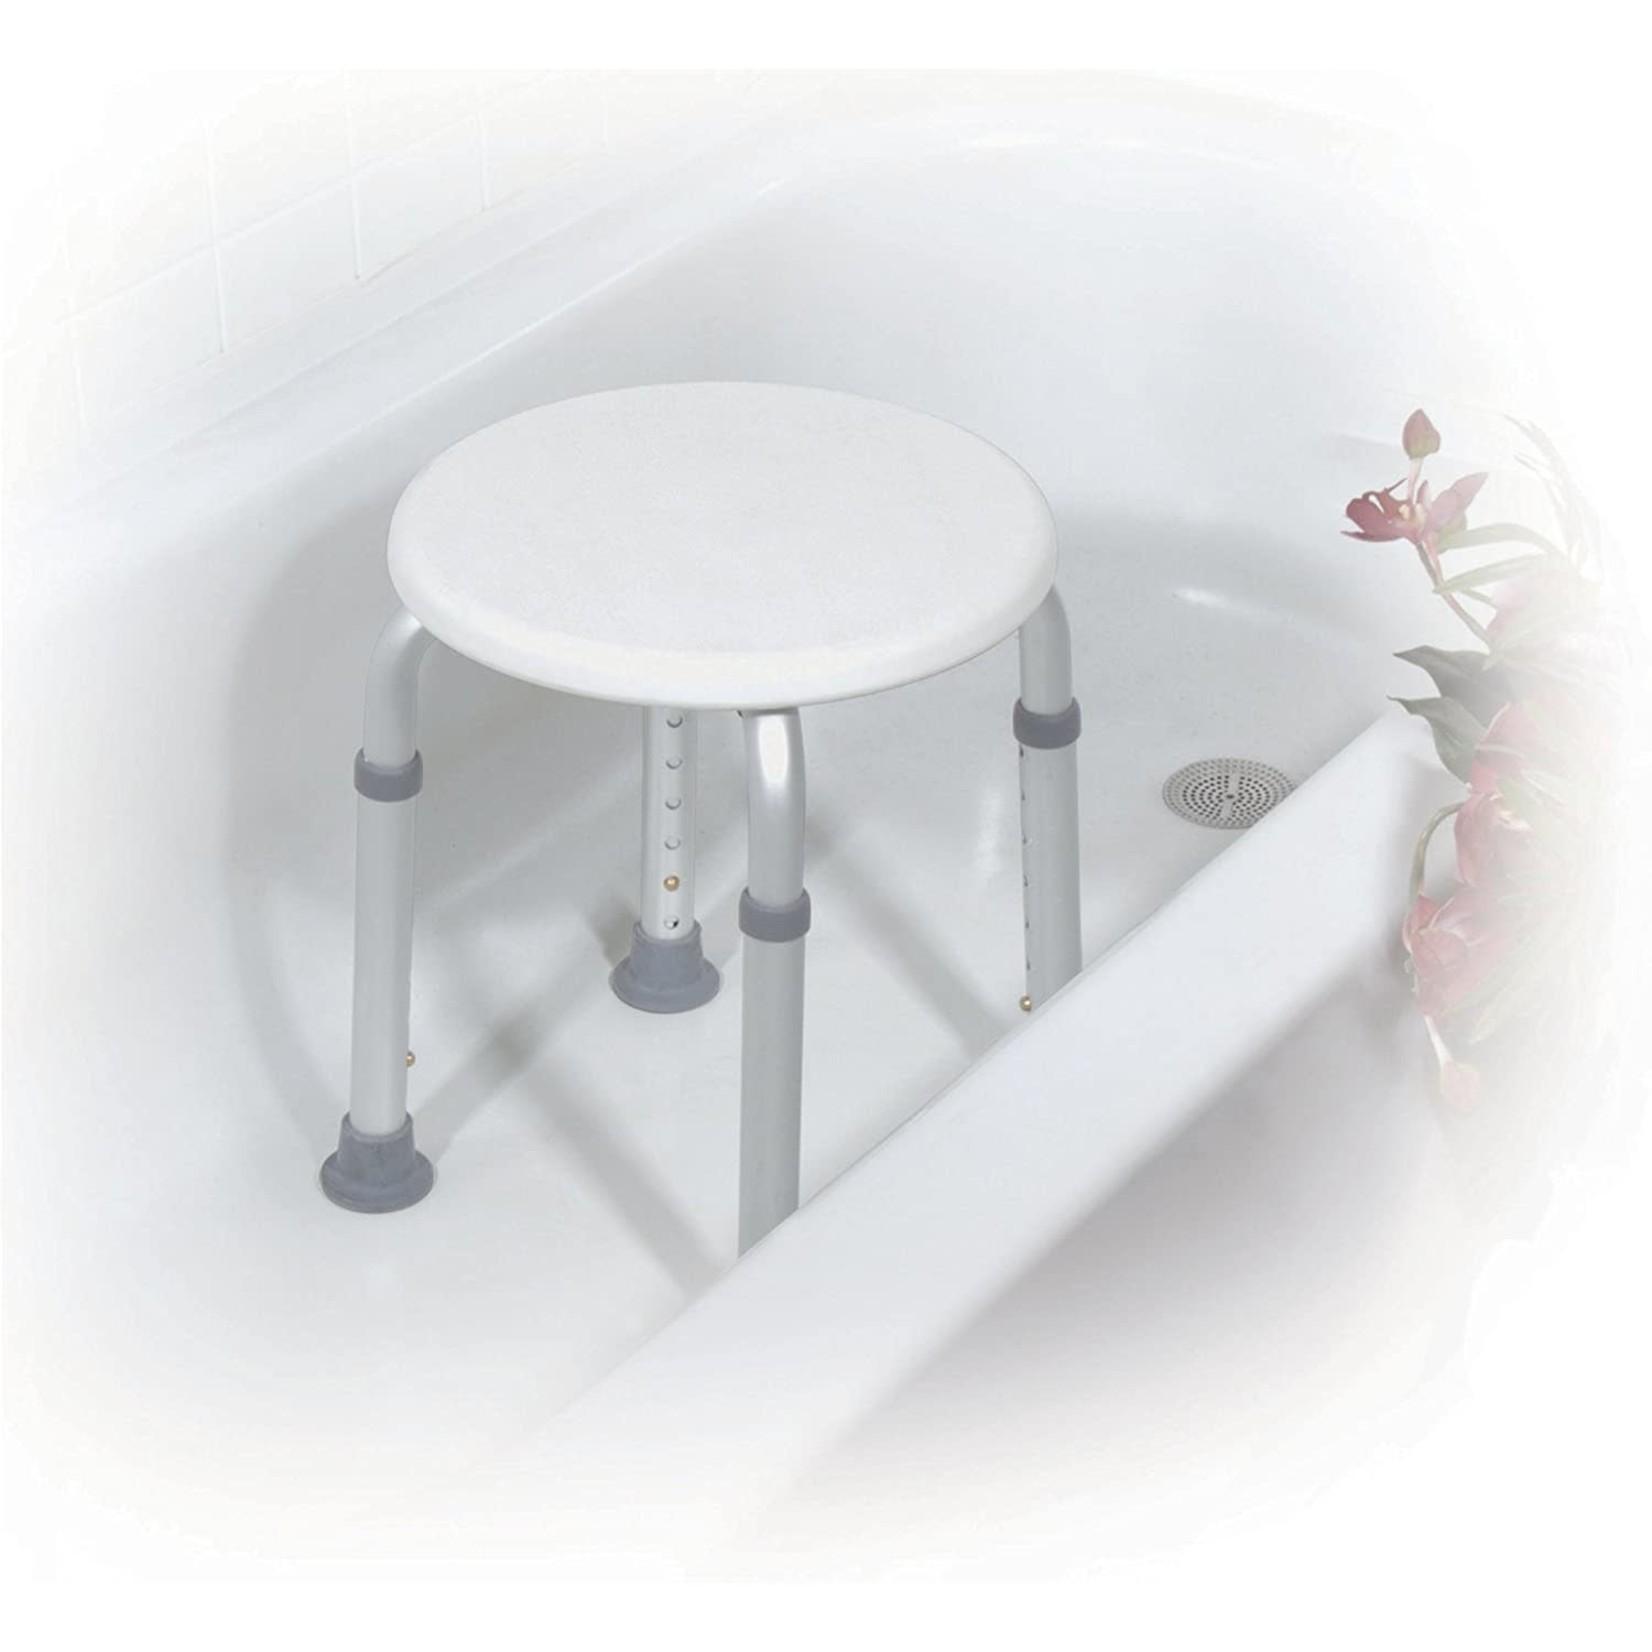 MOBB Bath/Shower Stool - Round